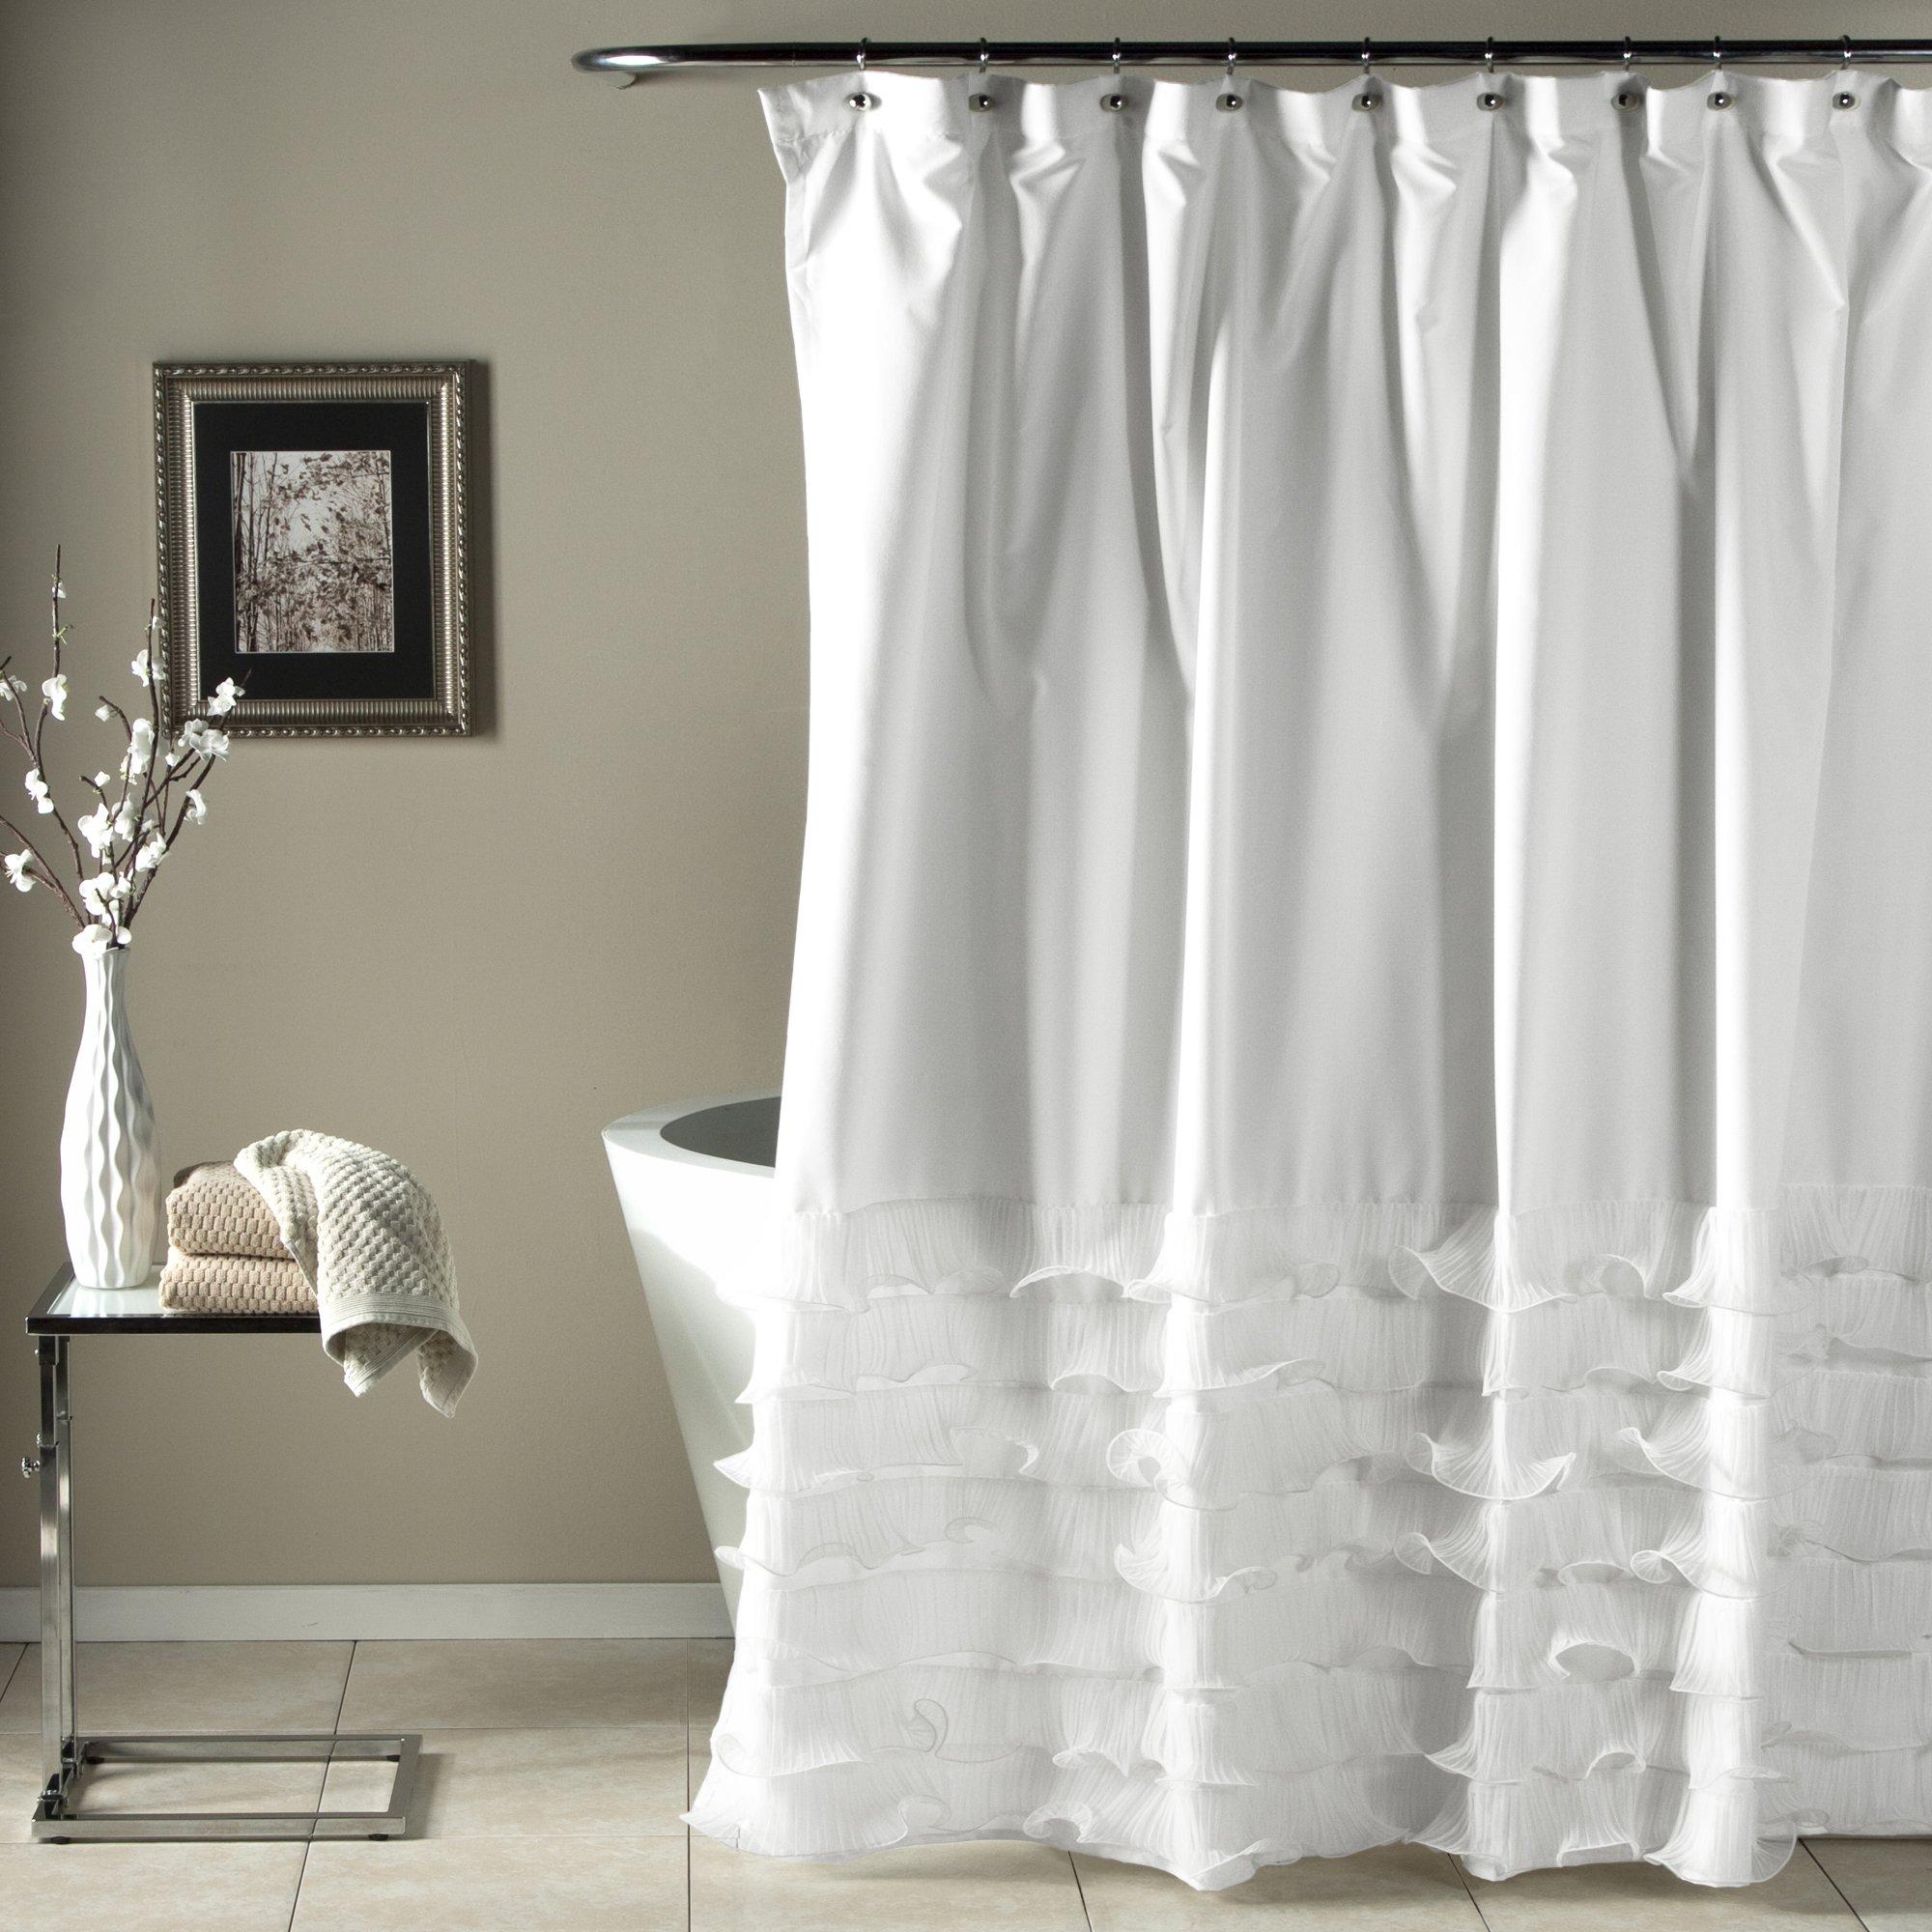 Lush Decor Avery Shower Curtain Ruffled Shabby Chic Farmhouse Style Bathroom, 72'' x 72'', White